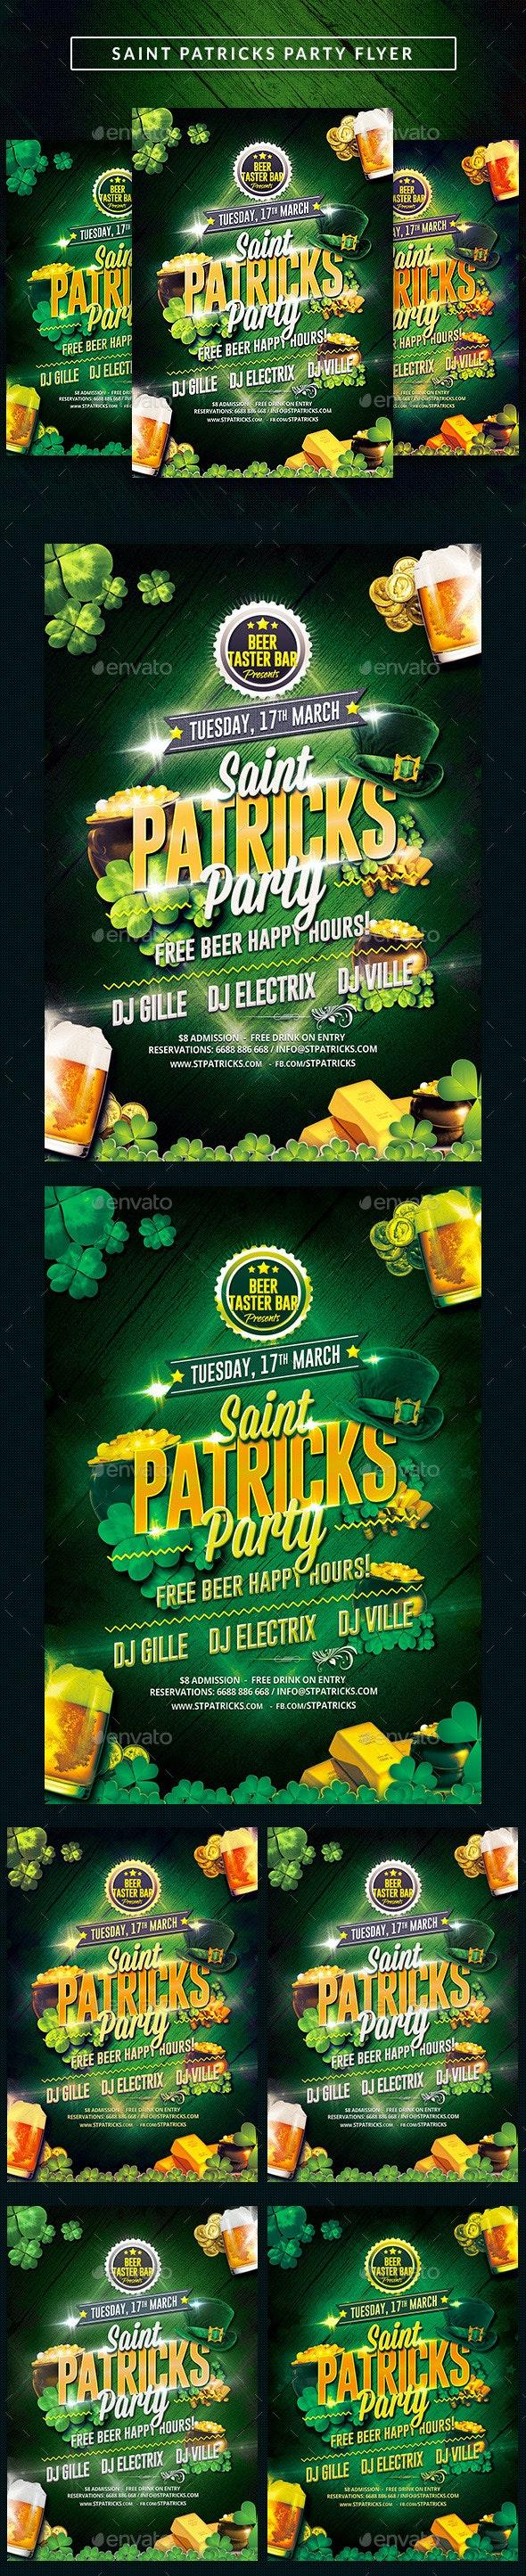 Saint Patricks Party Flyer - Clubs & Parties Events